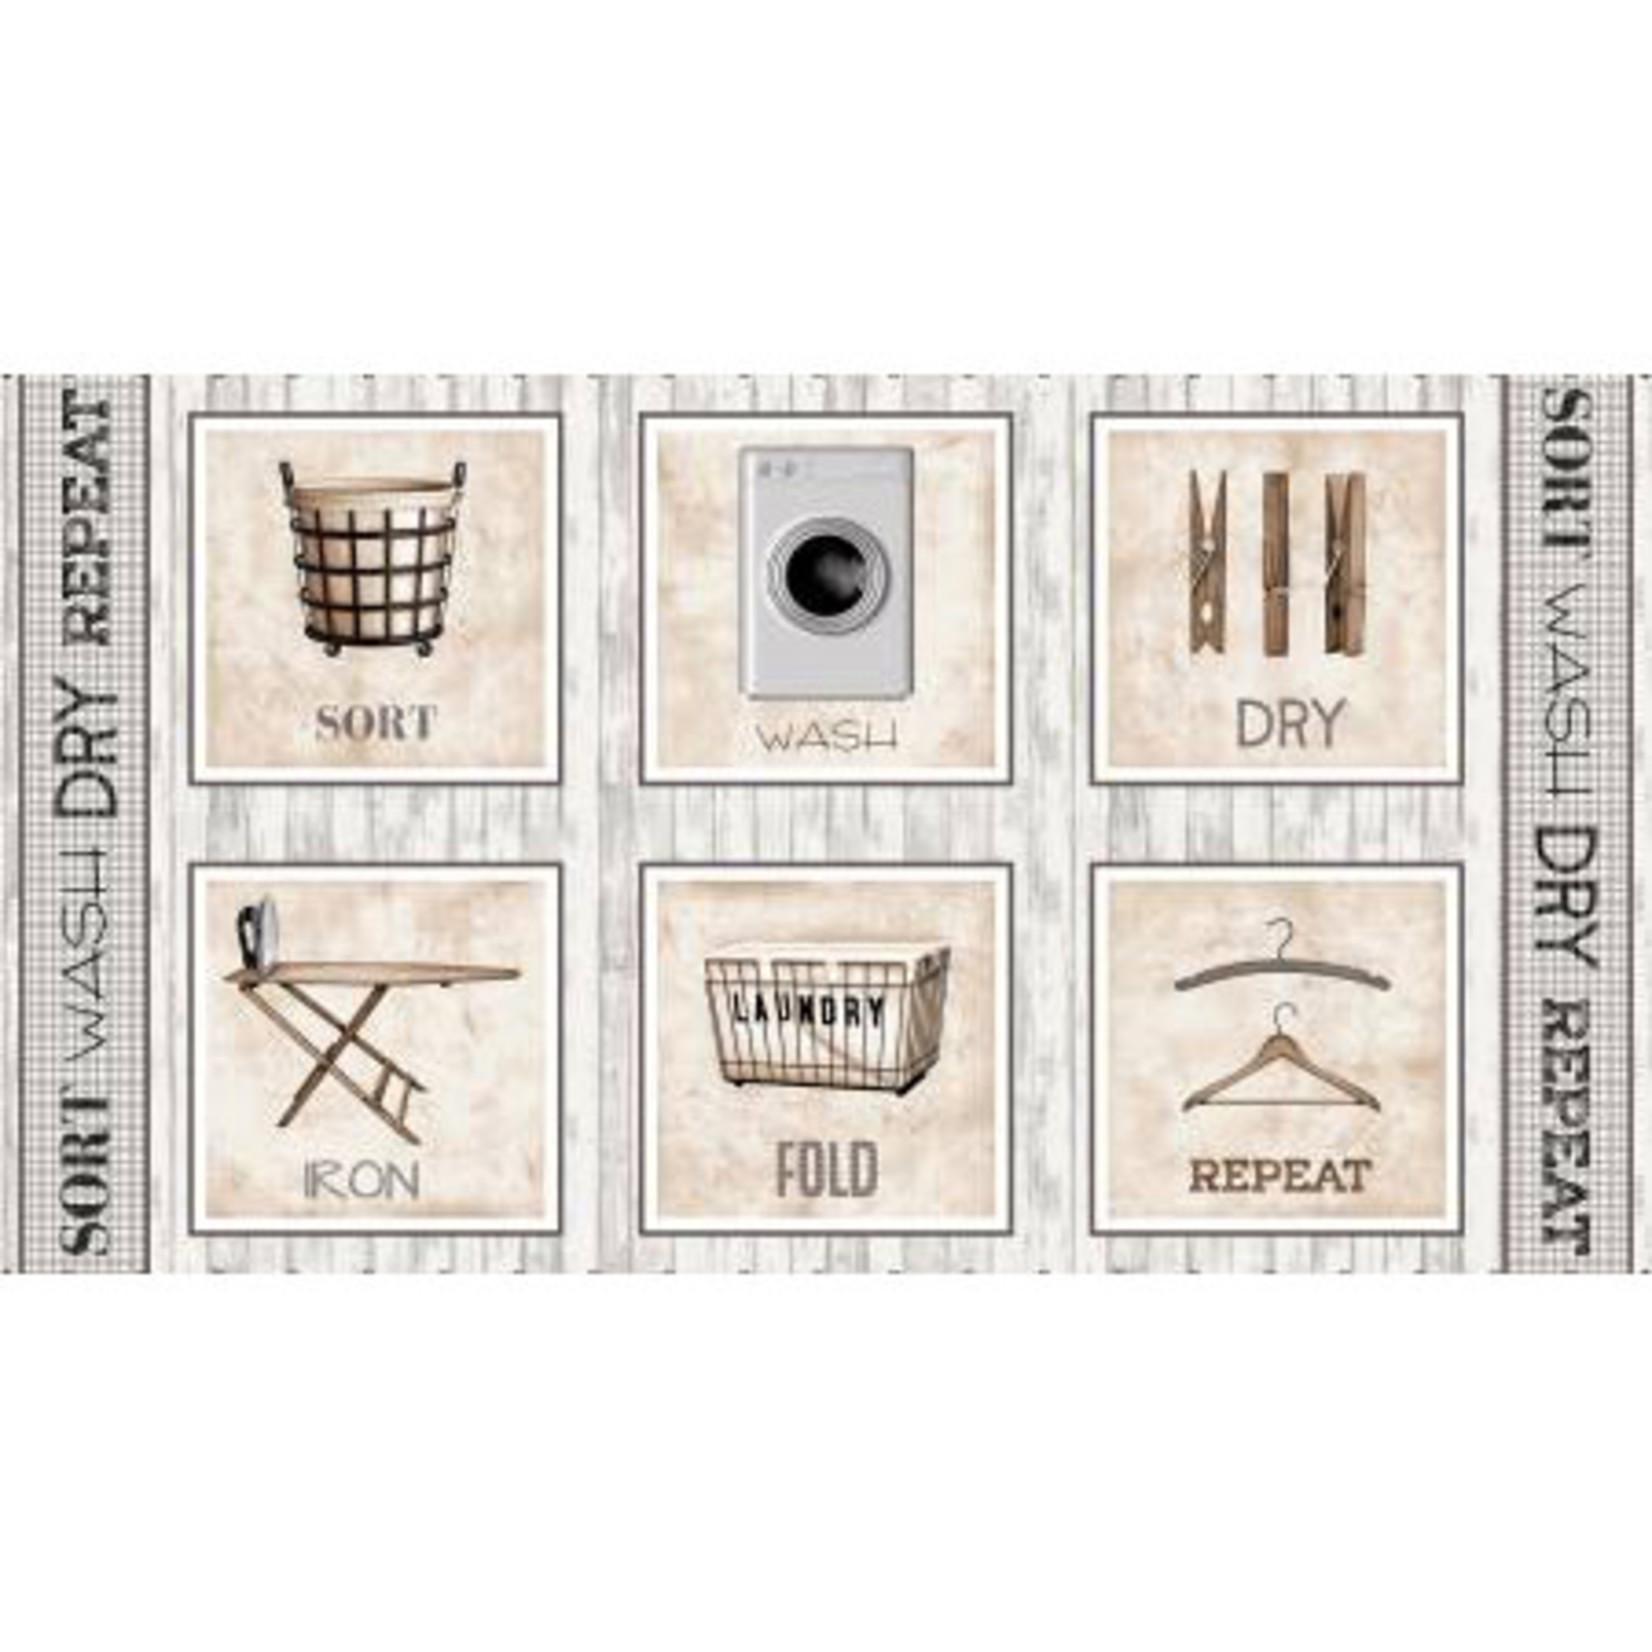 StudioE Fabrics Loads of Fun - Blocks - Panel